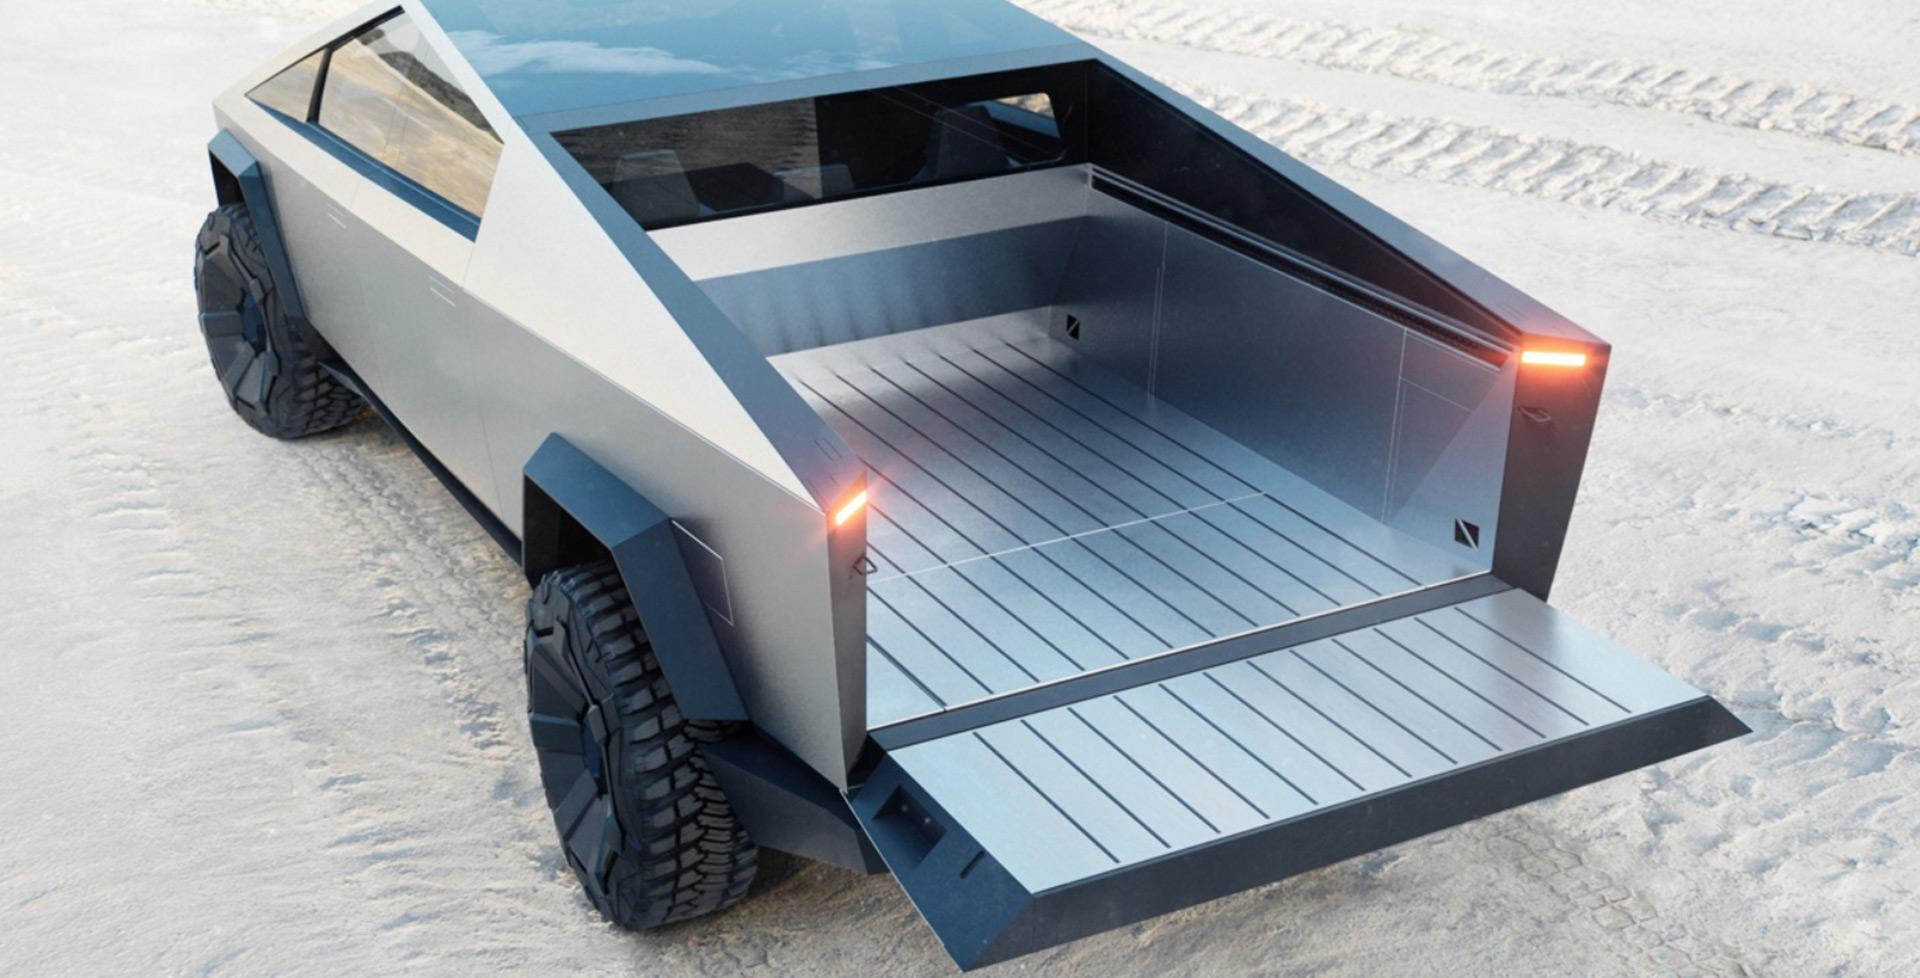 Tesla Semi and Cybertruck delay, Rivian second factory, Hyundai fuel-cell semis: Today's Car News